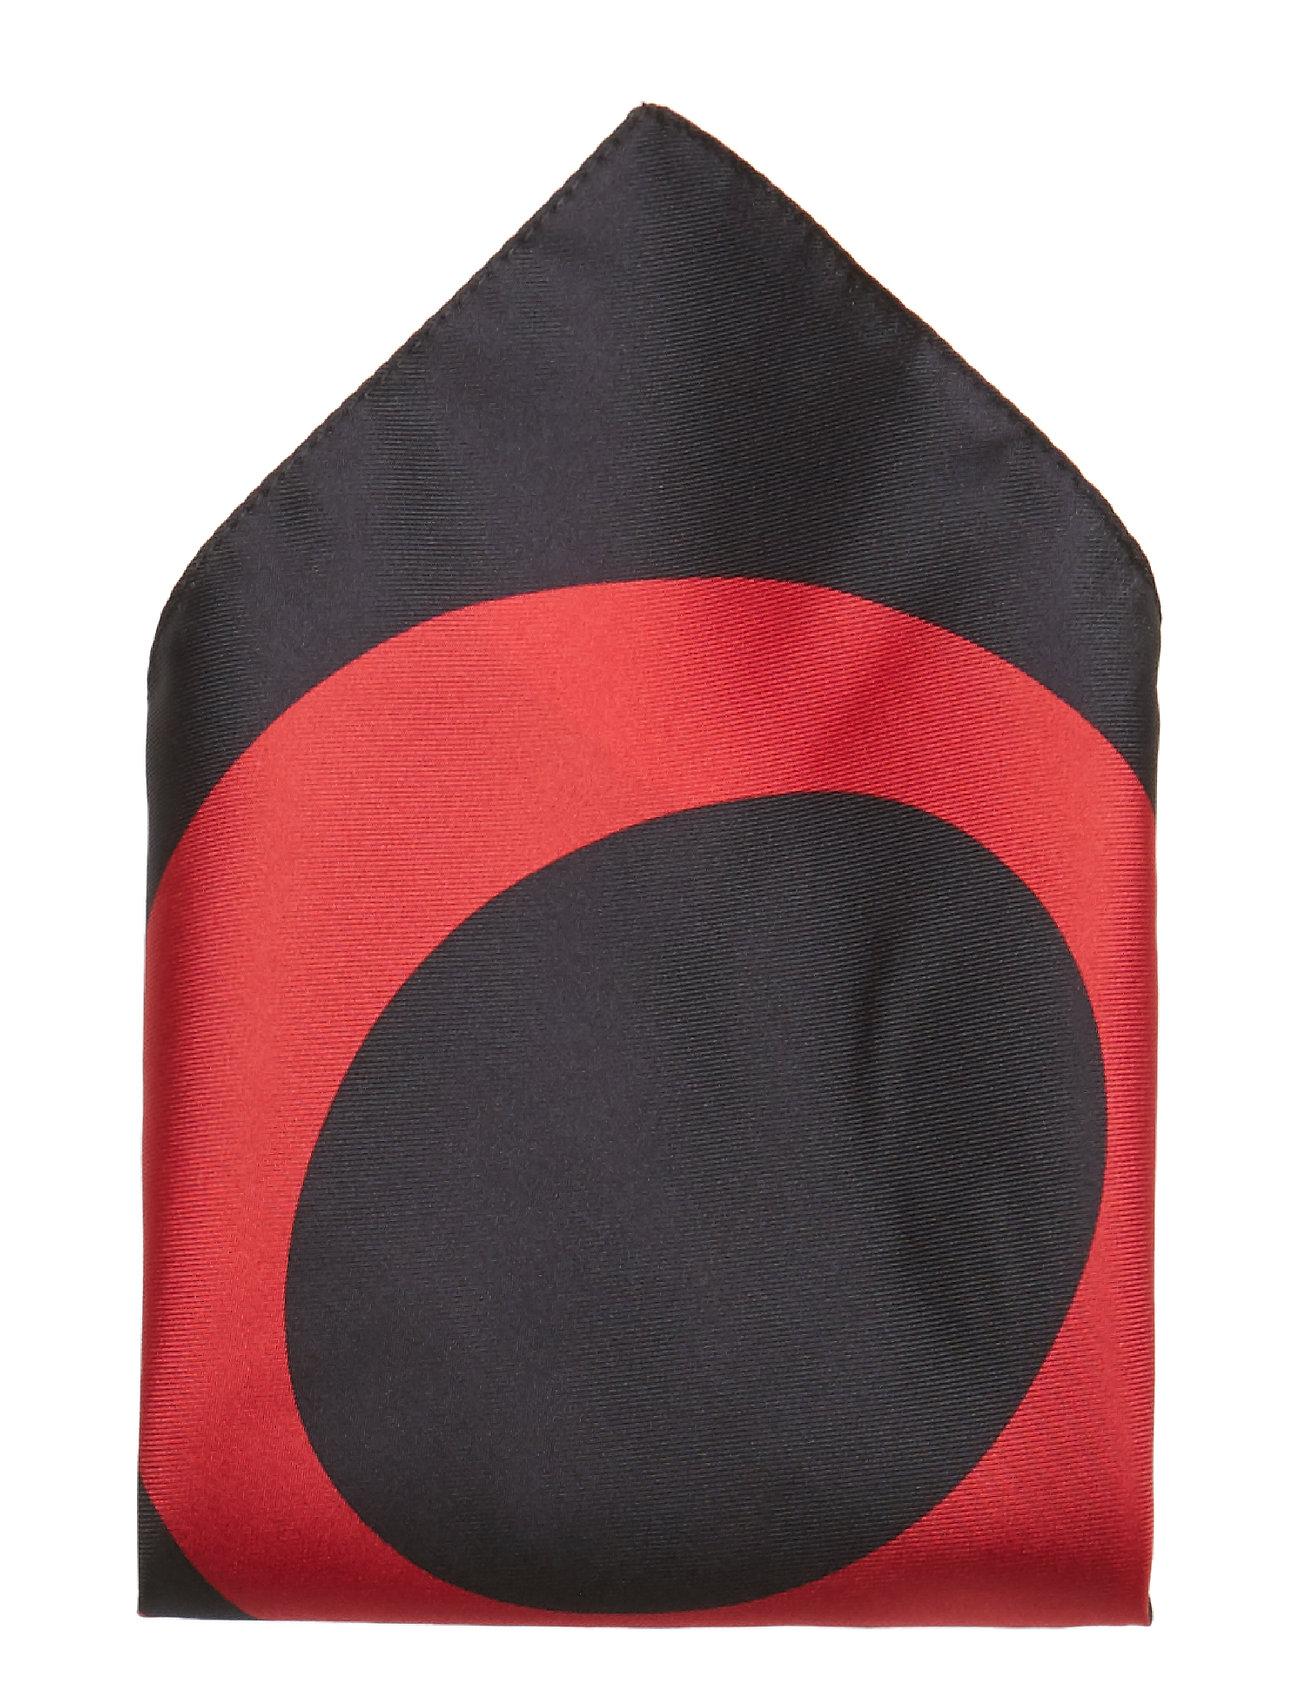 Pocketsquare 33x33cm Brystlommetørklæde Rød HUGO